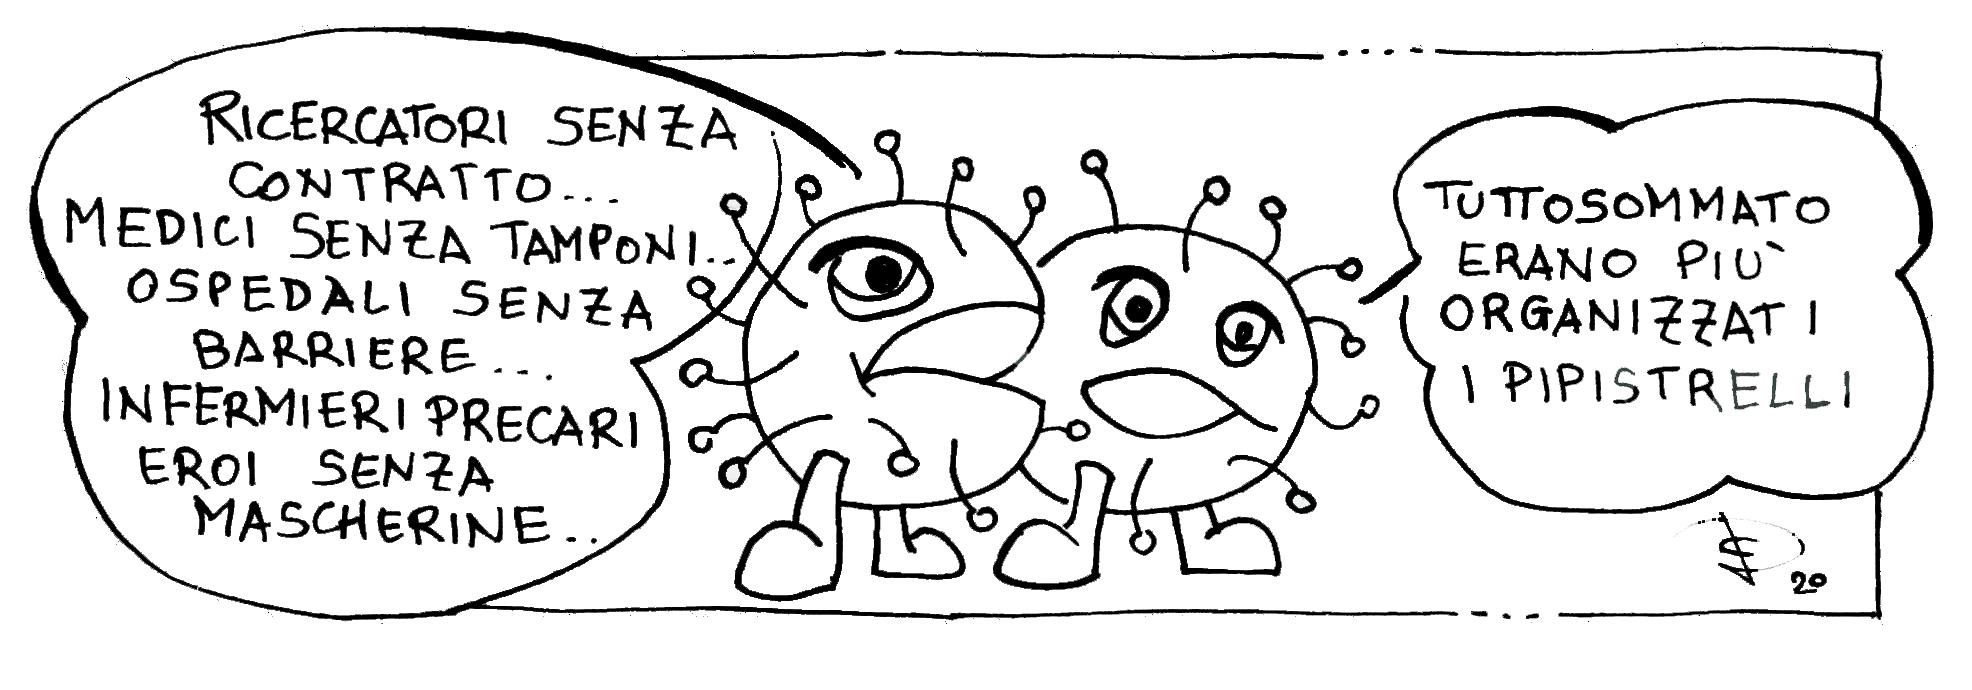 vignetta di Pietro Ferrara